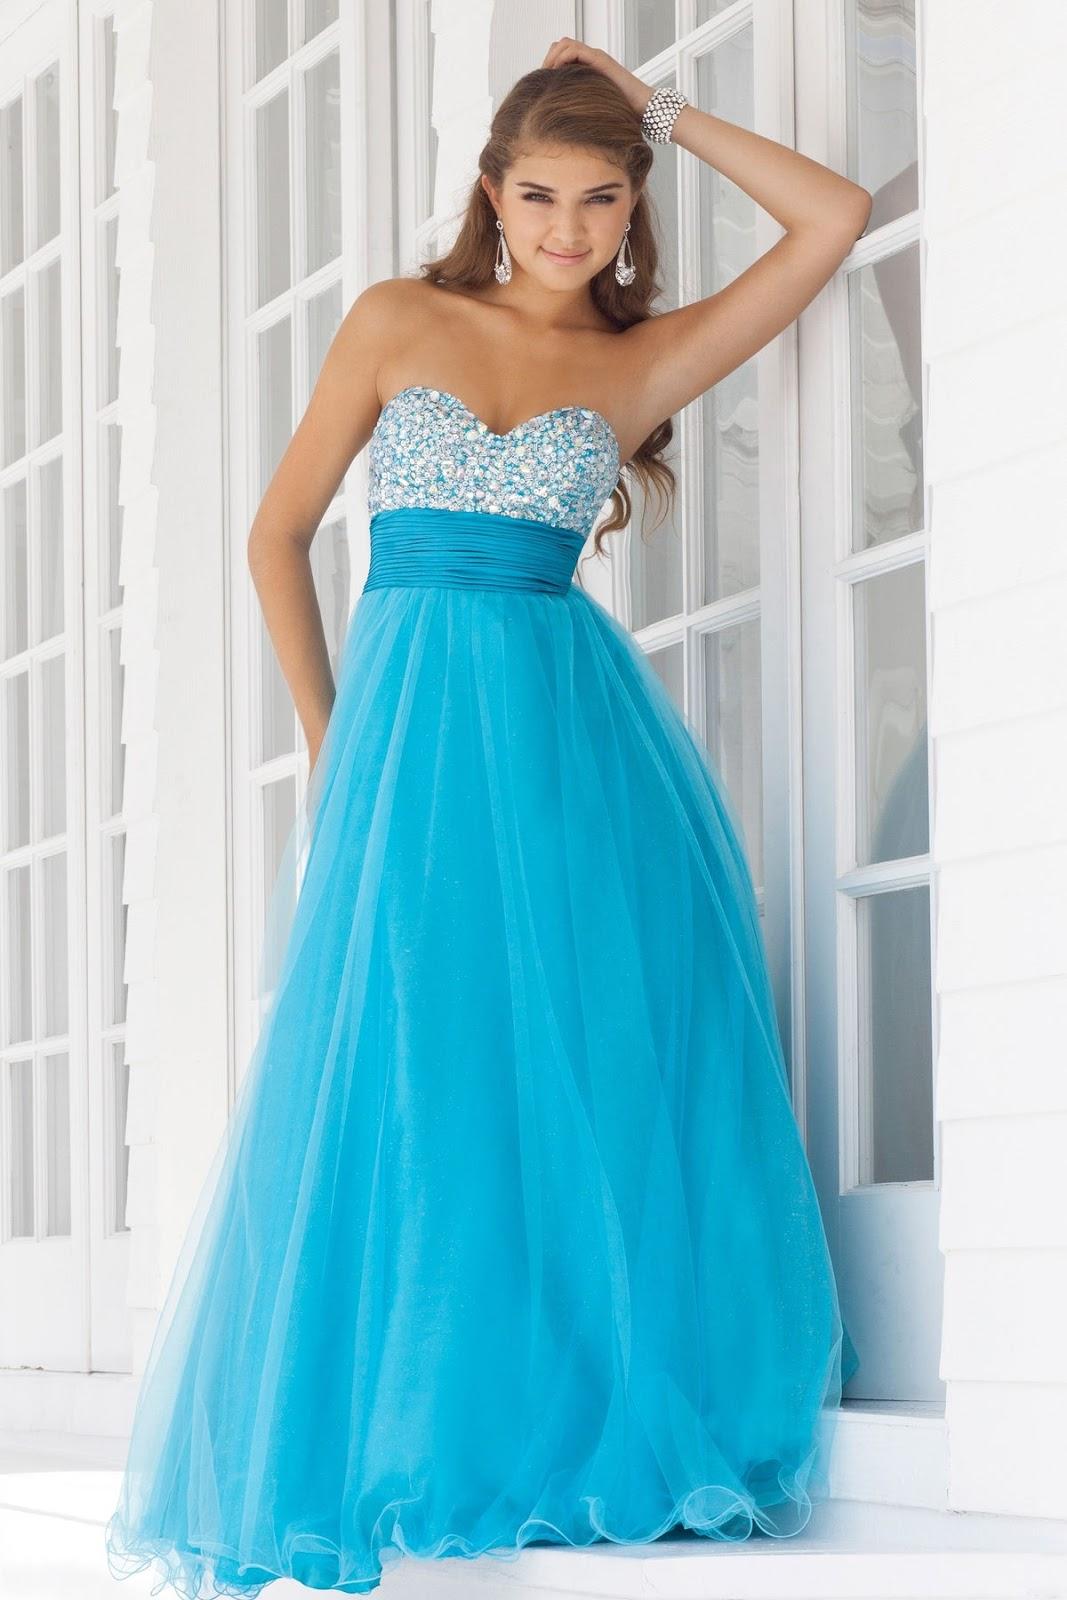 Plus size homecoming dresses ebay